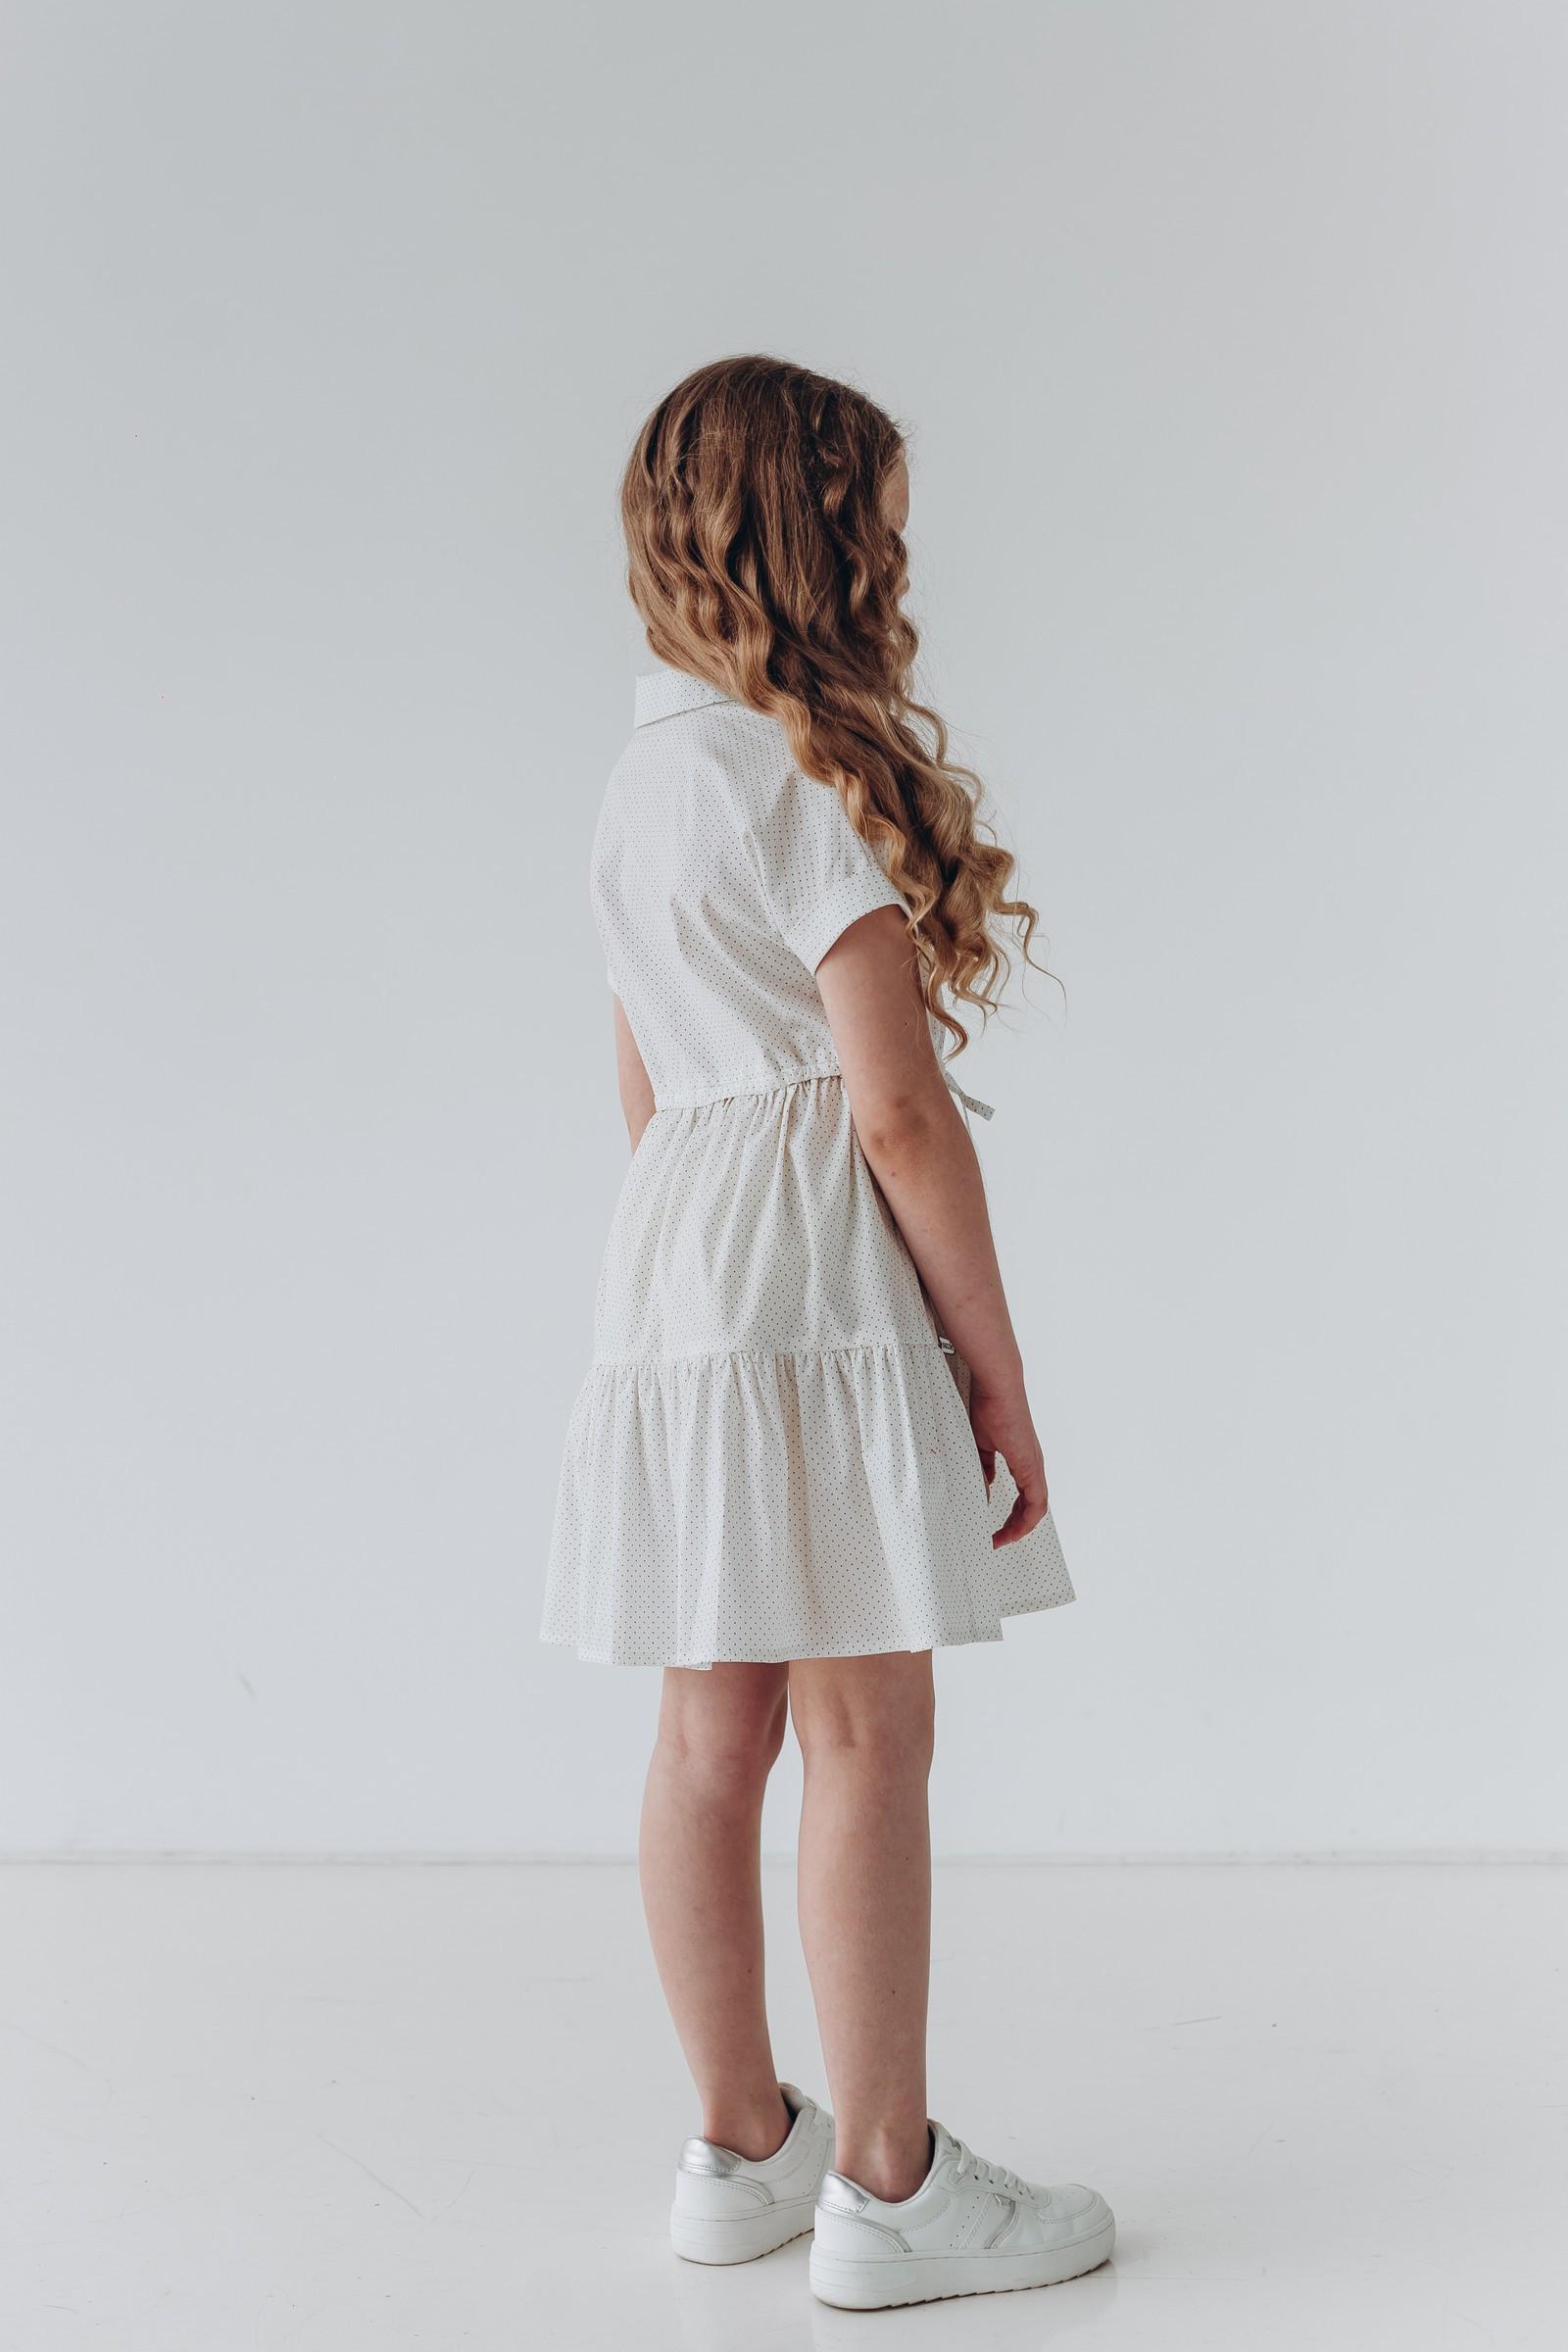 Плаття Ніколеса, фото №4